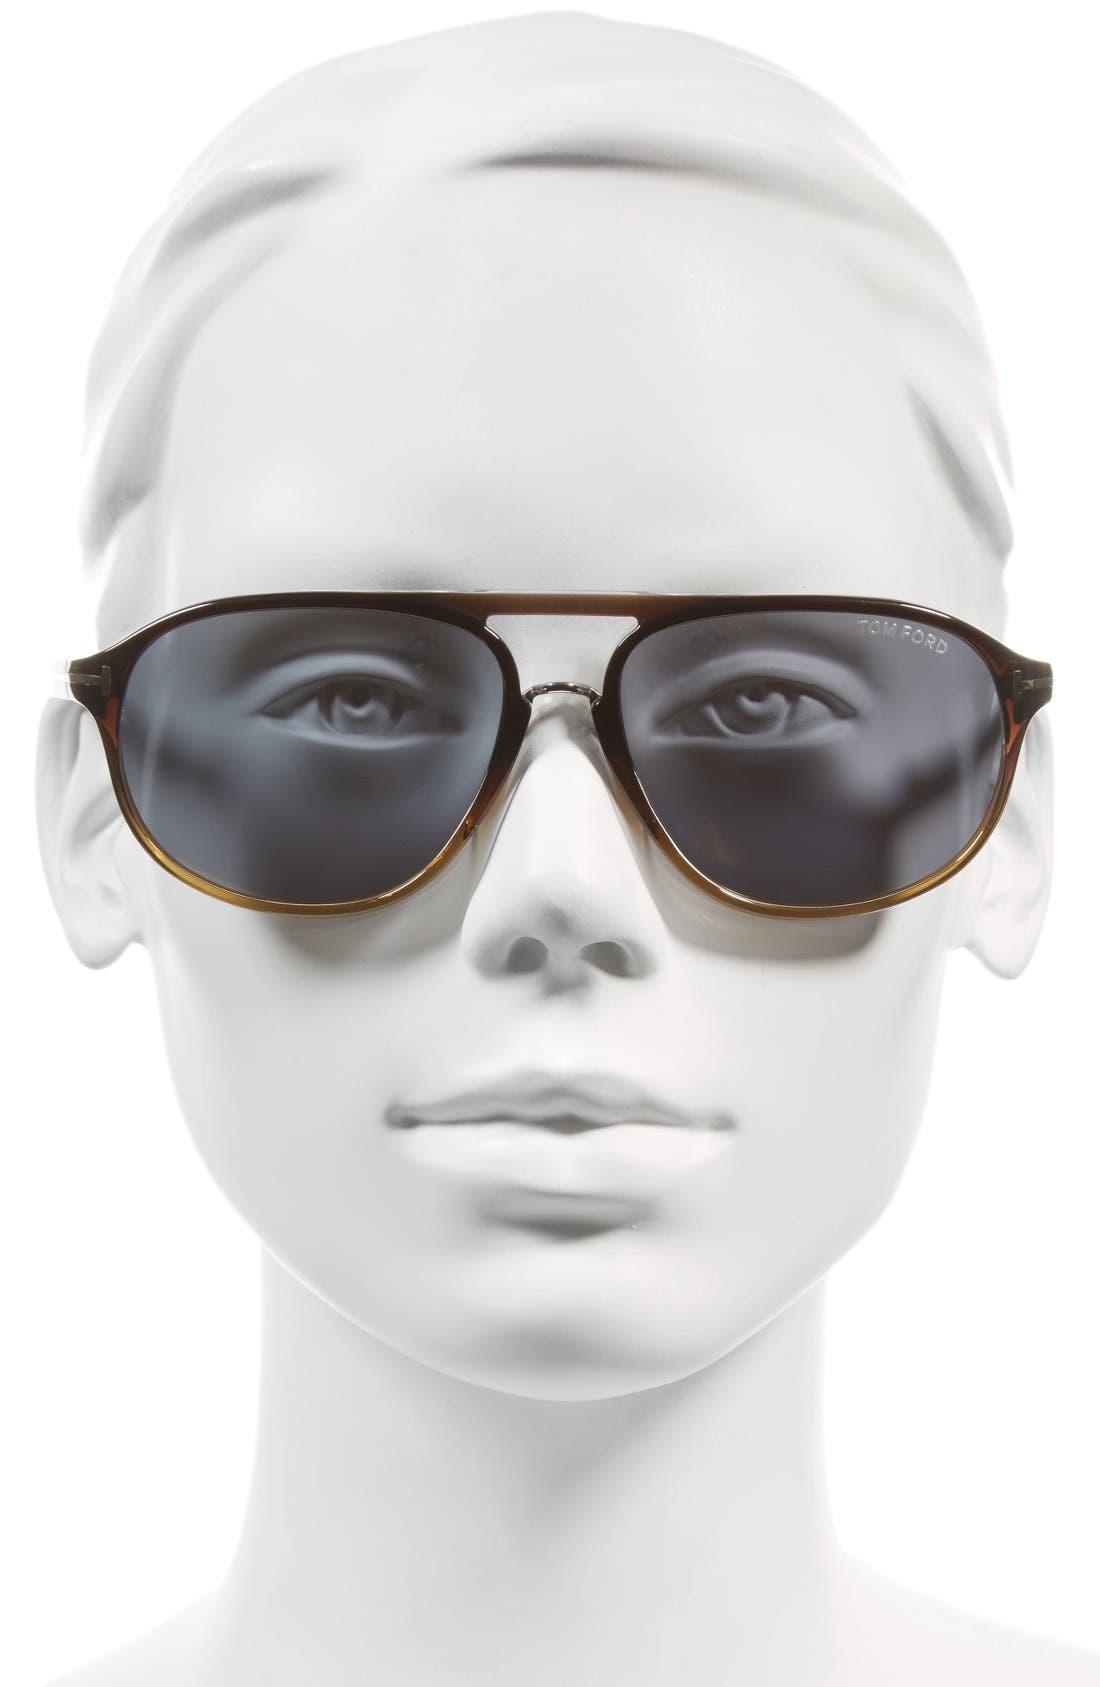 Jacob 60mm Retro Sunglasses,                             Alternate thumbnail 2, color,                             Black/ Other/ Smoke Mirror